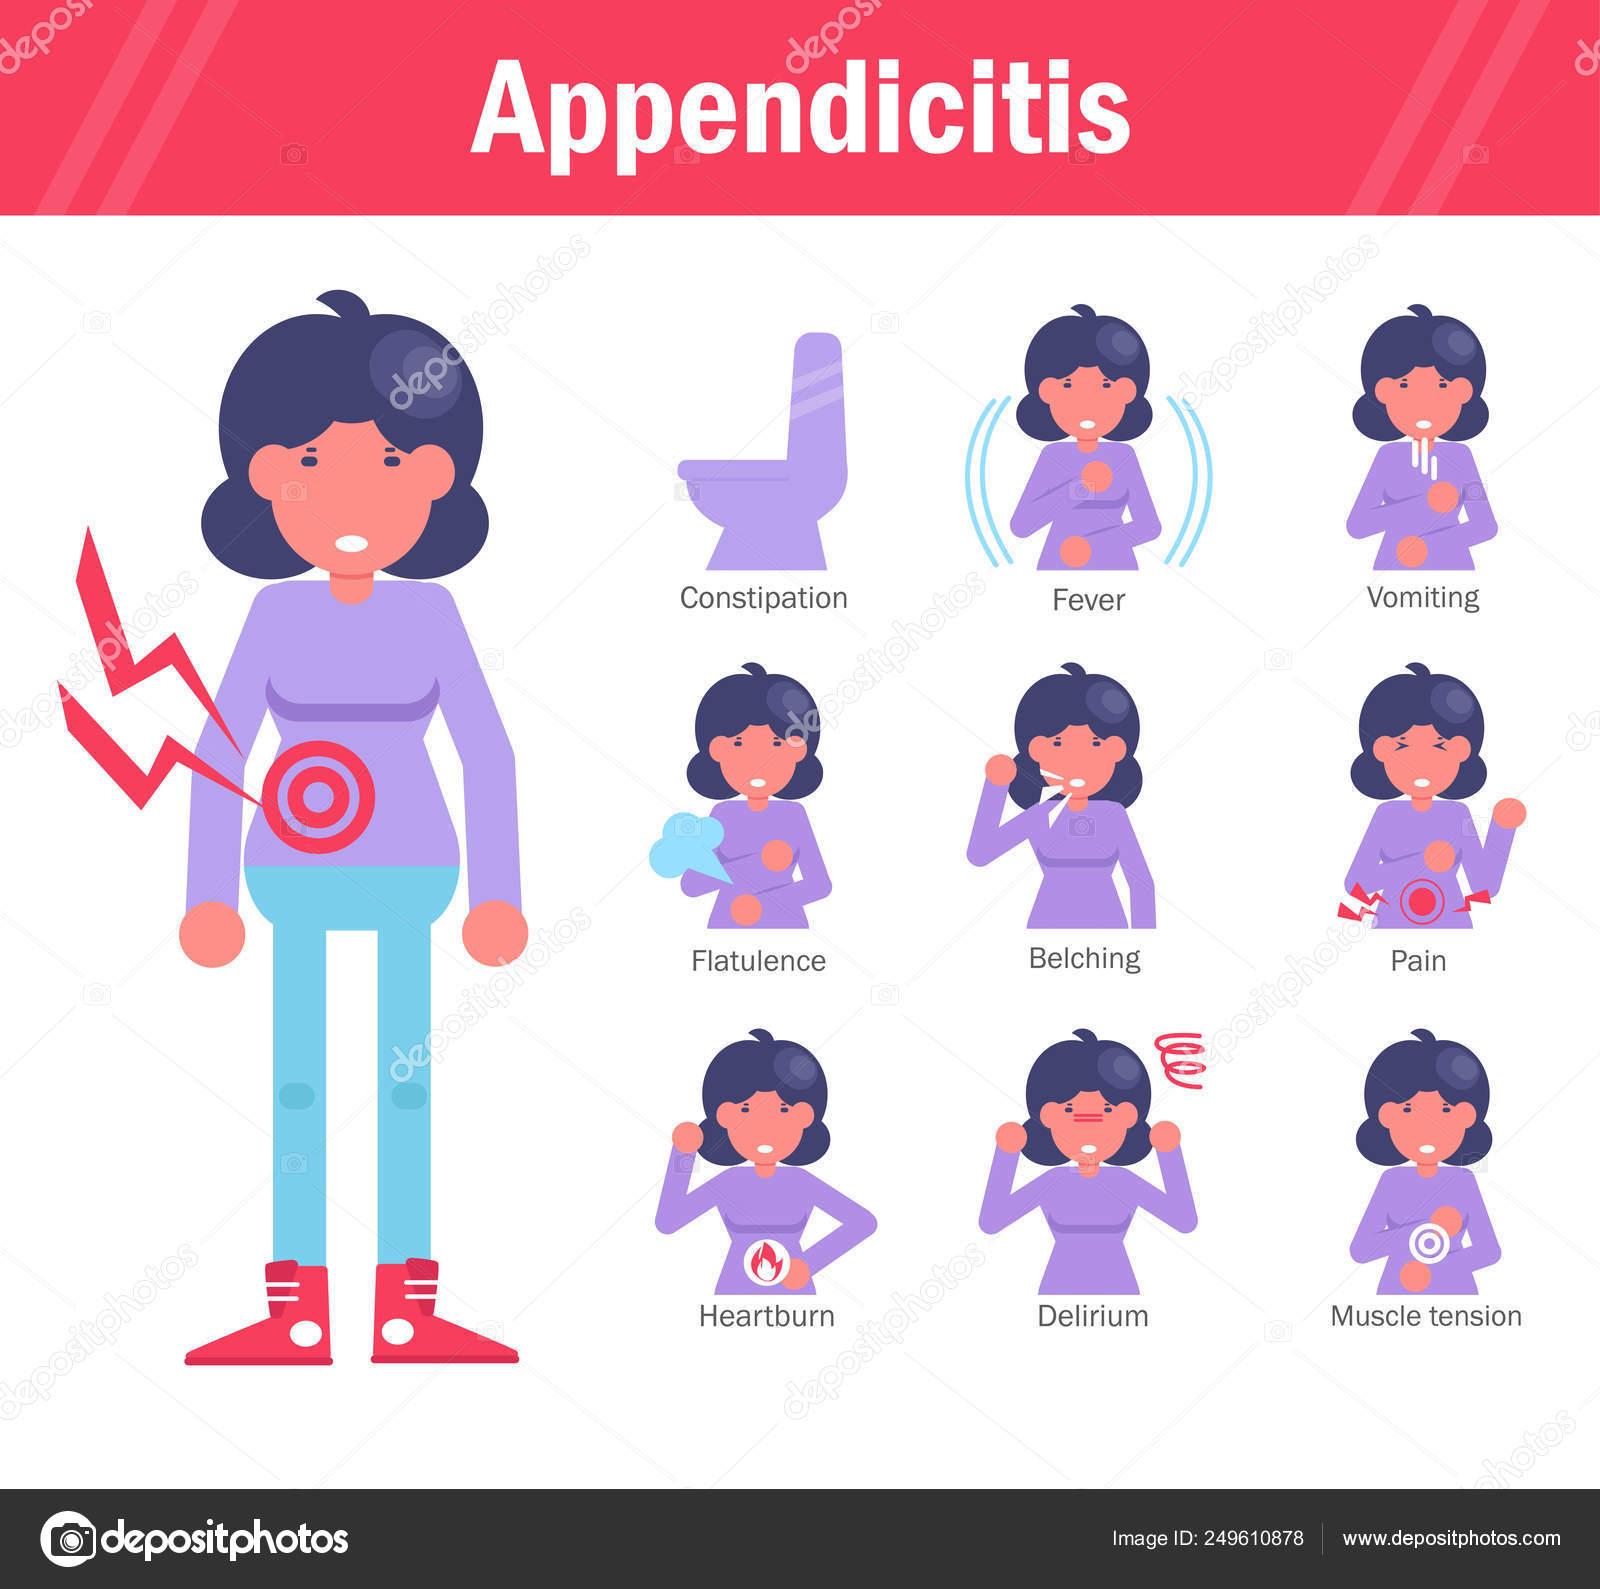 Apendice sintomas em portugues